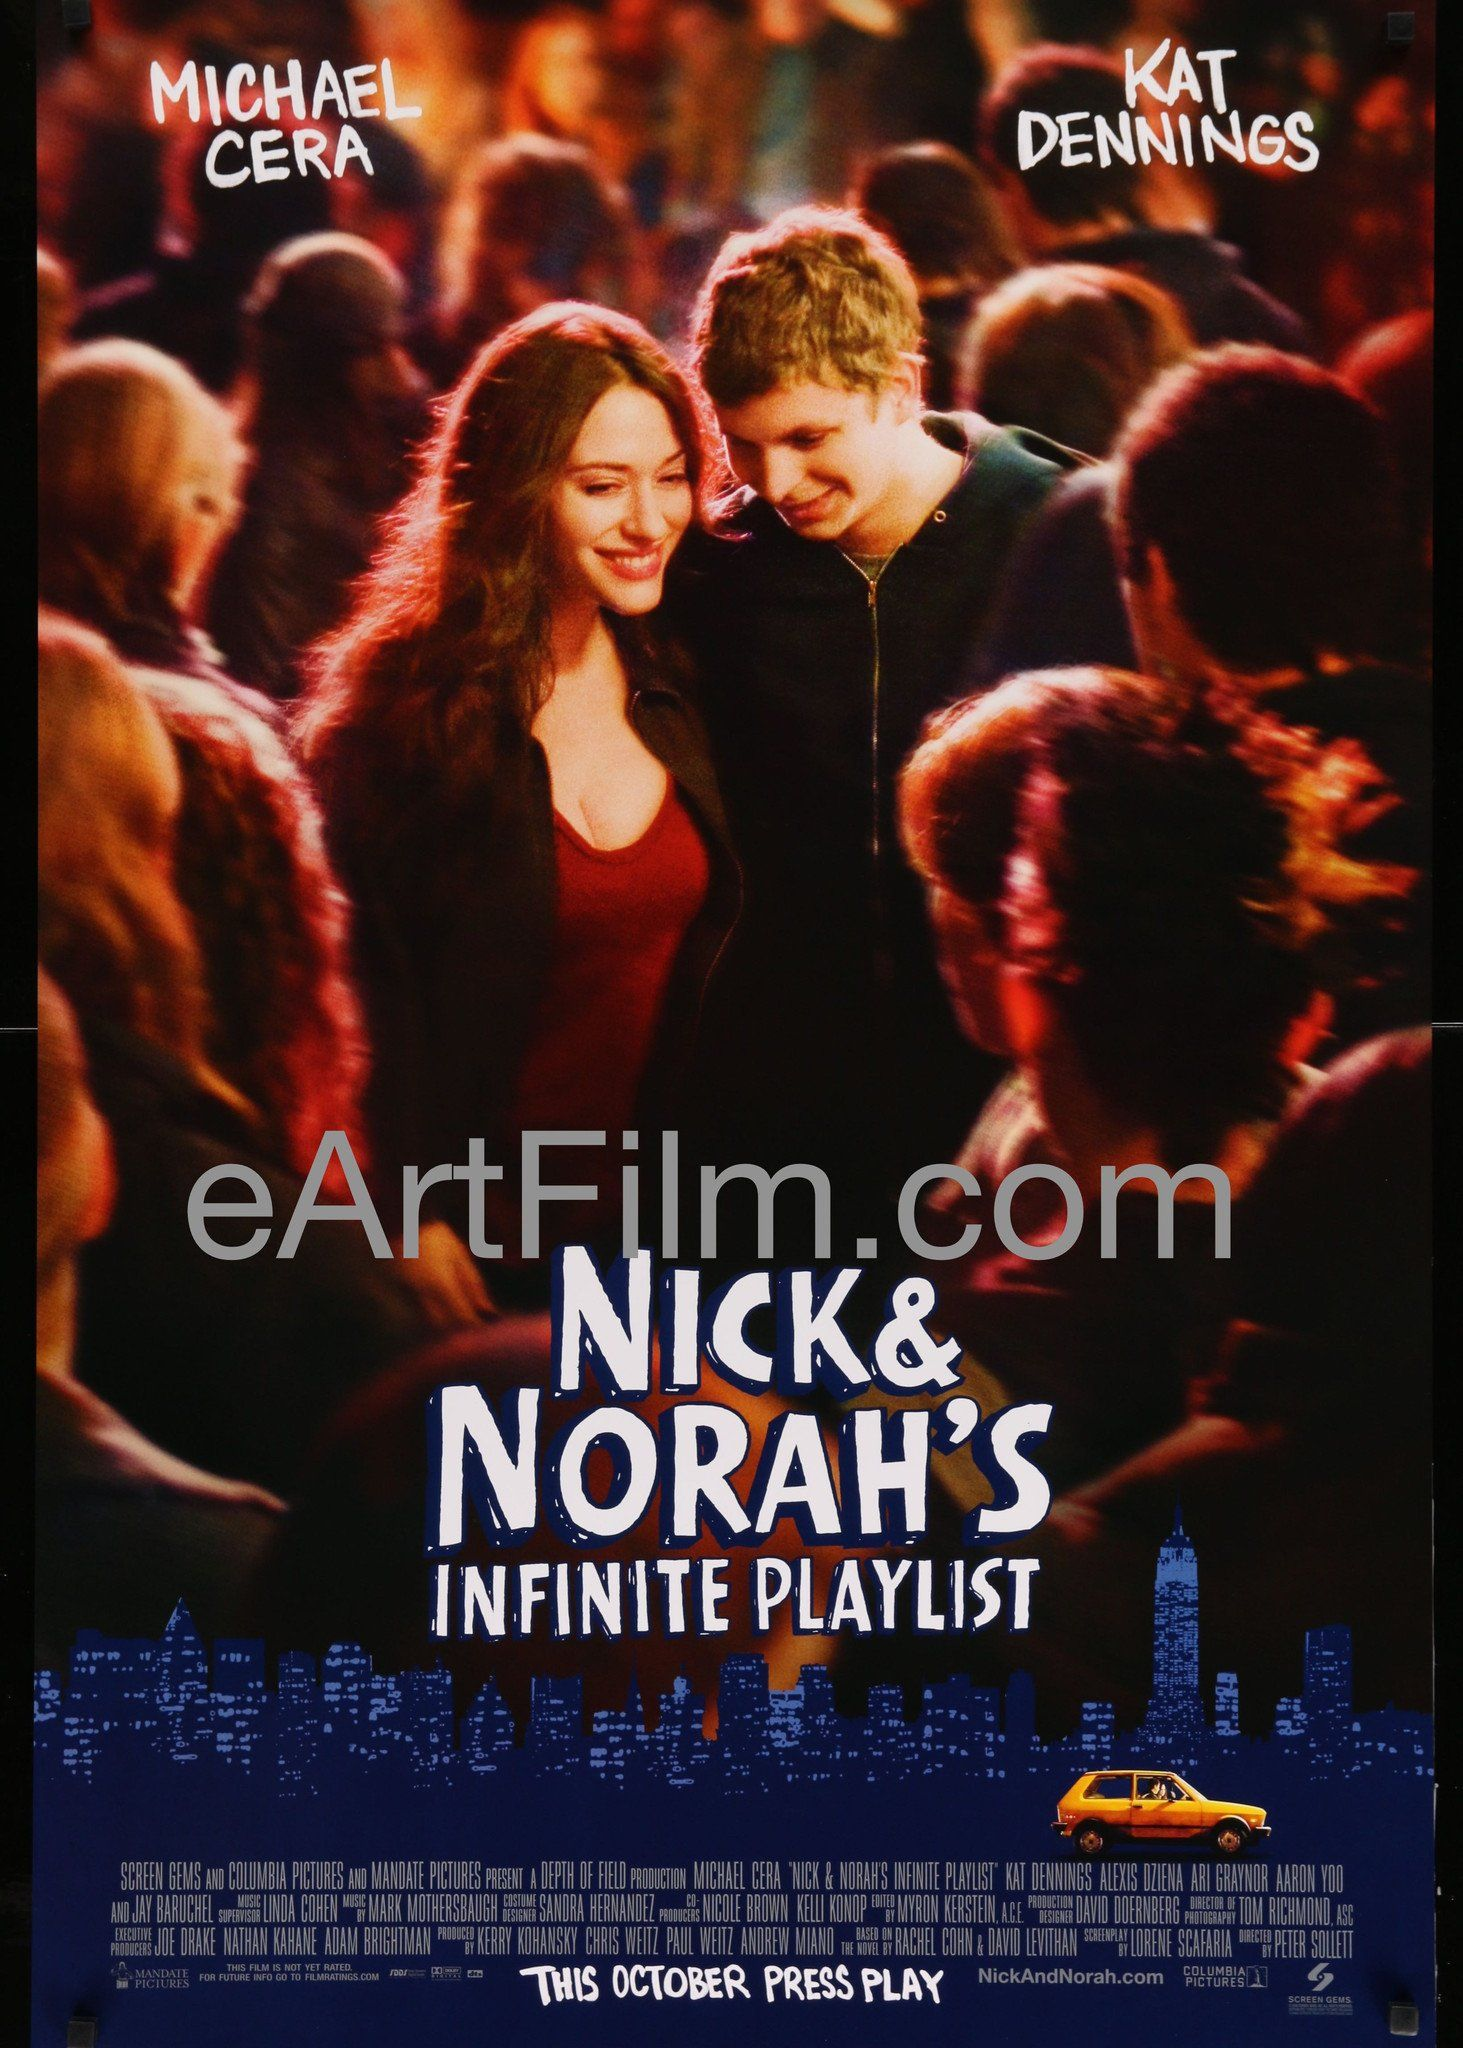 Nick and Norah\'s Infinite Playlist-2008-27x40-Michael Cera-Kat Dennings